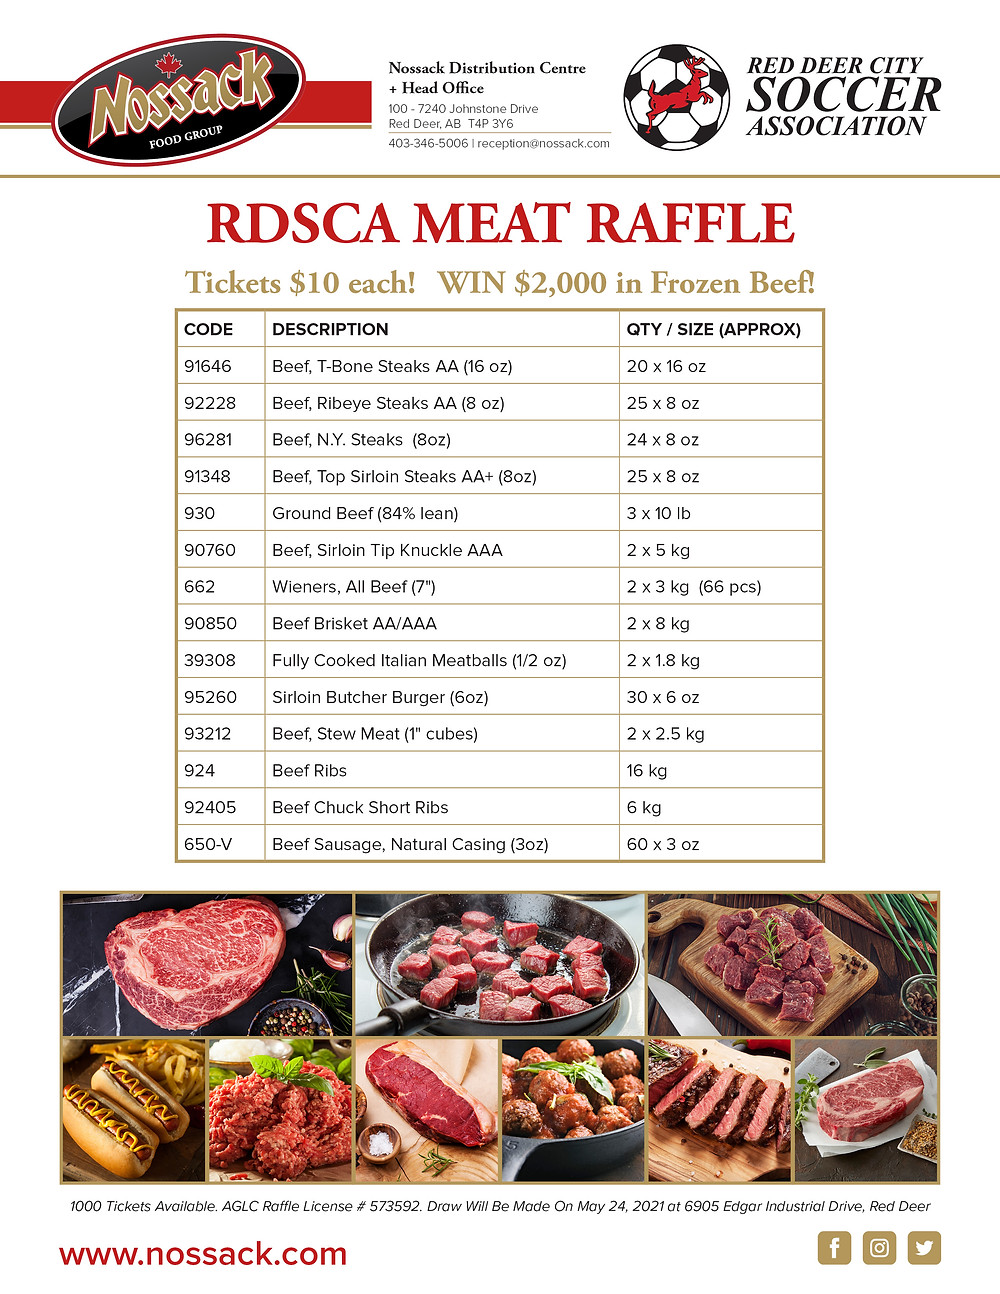 RDSCA Meat Raffle Details